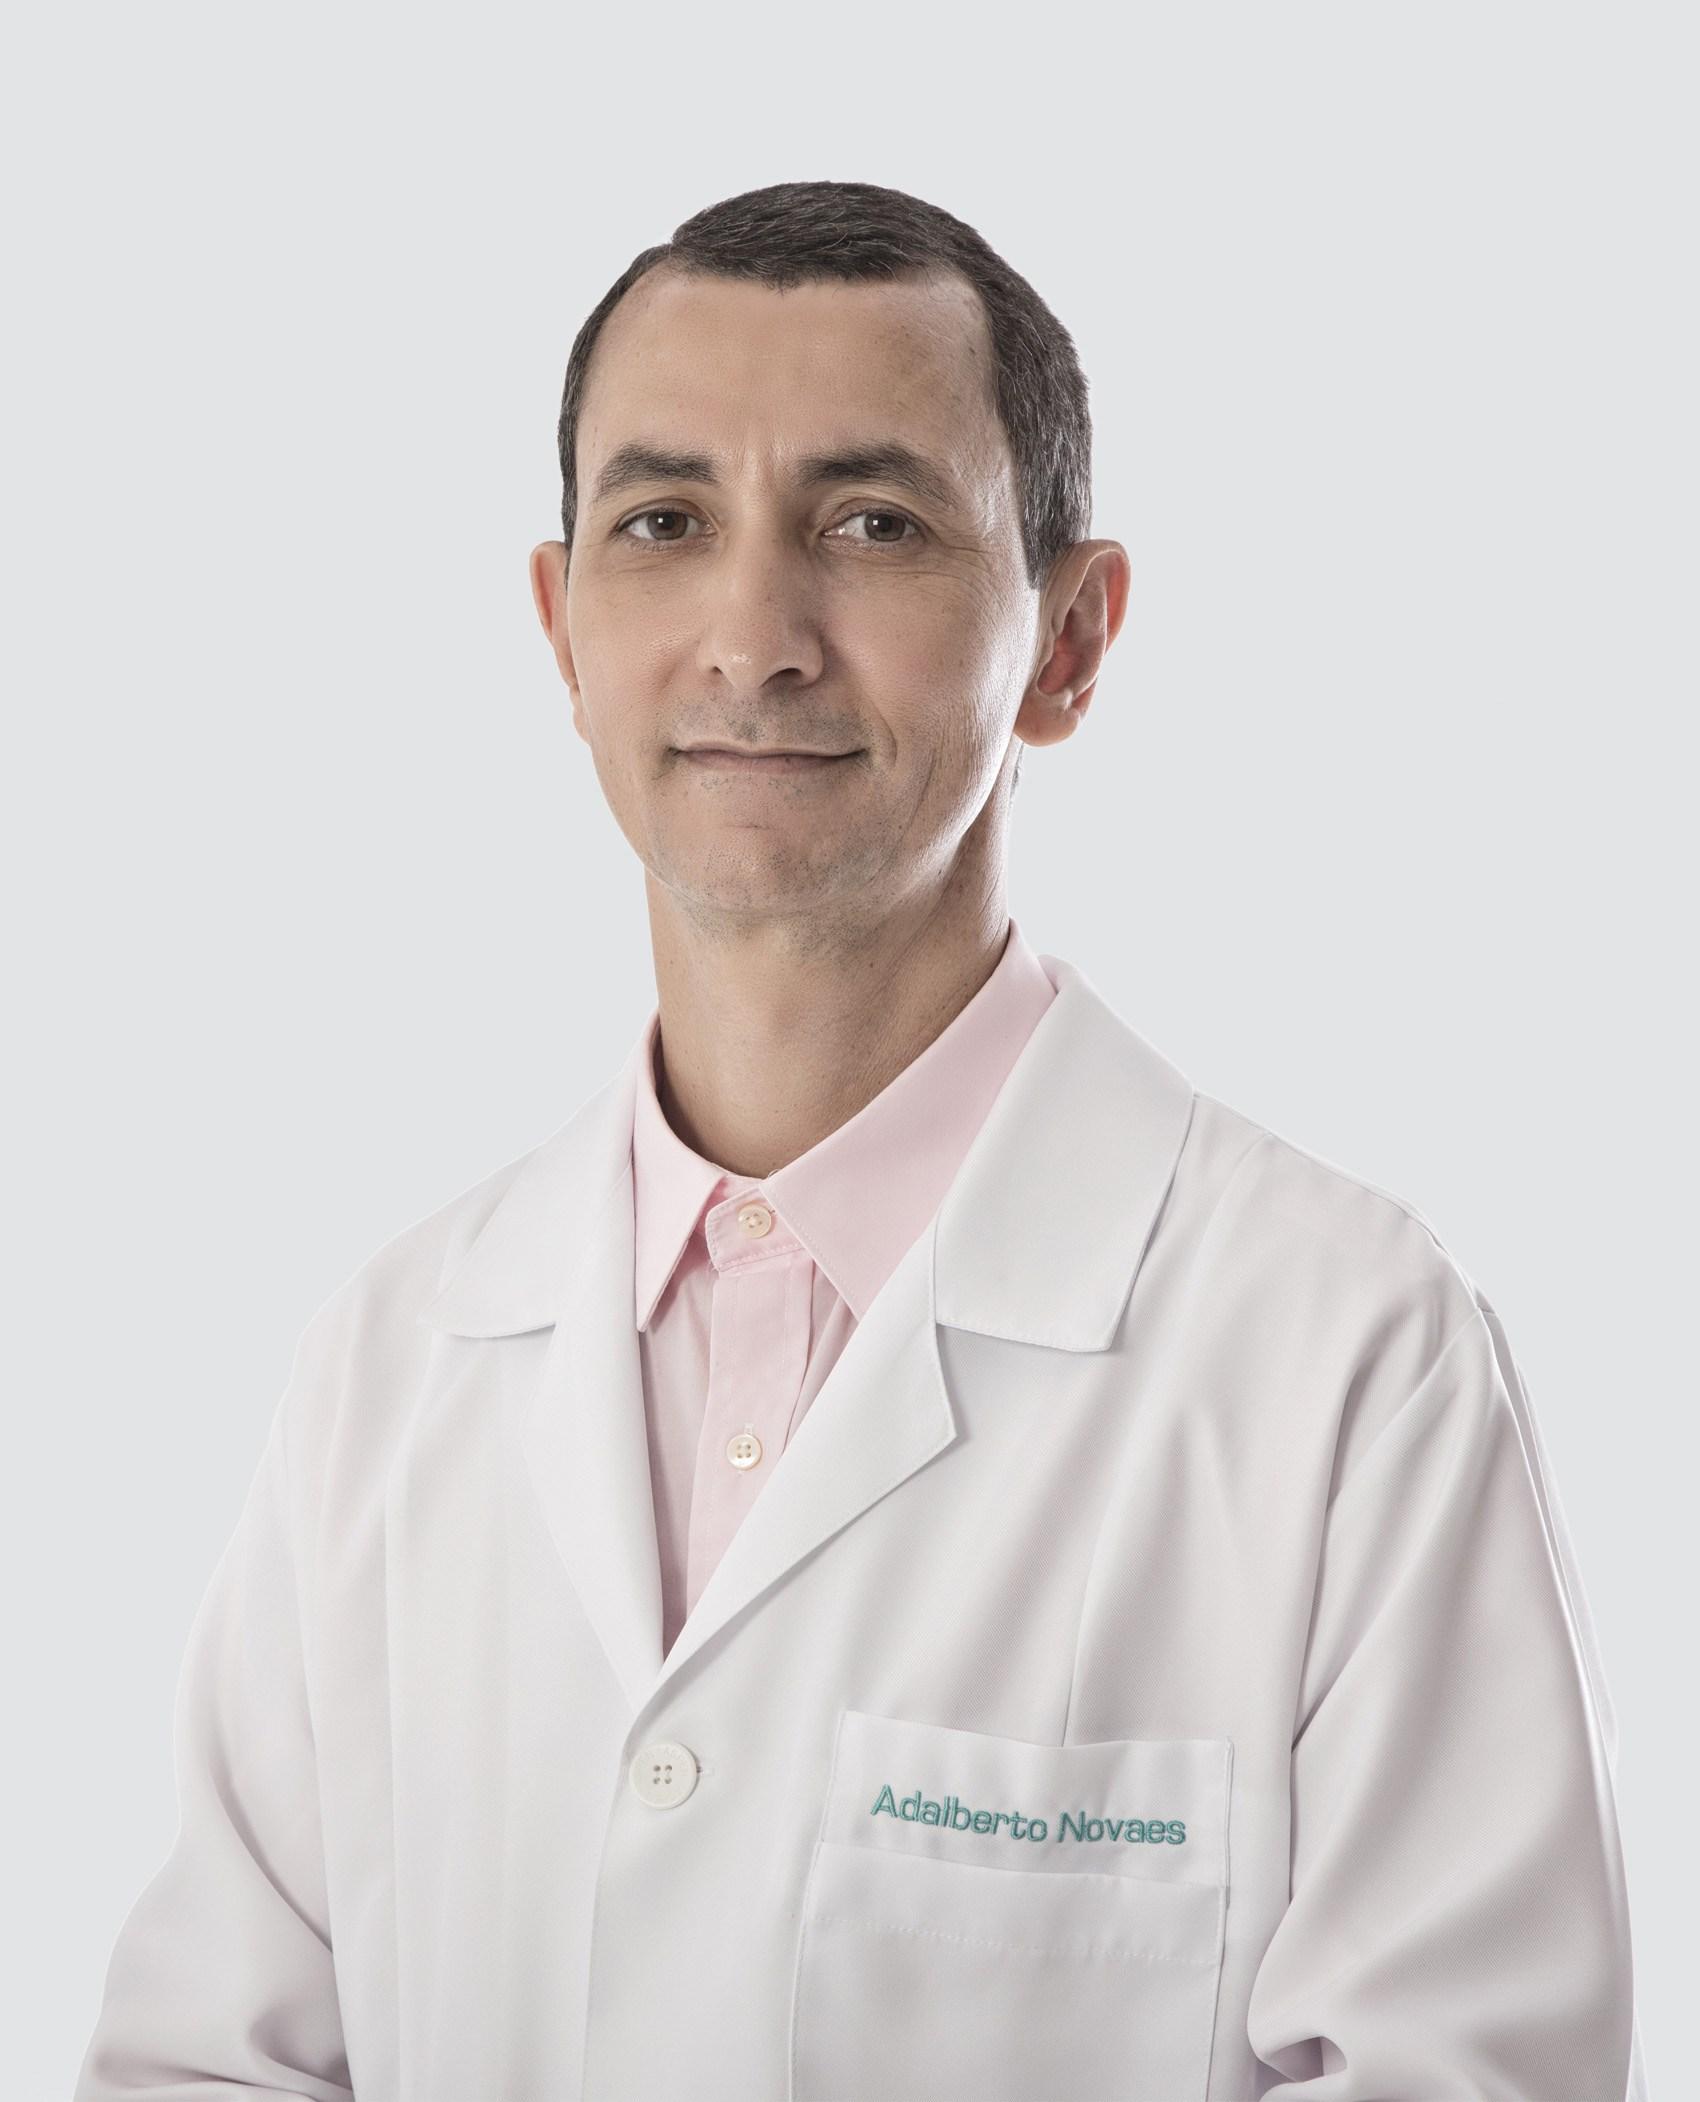 Dr. Adalberto Novaes